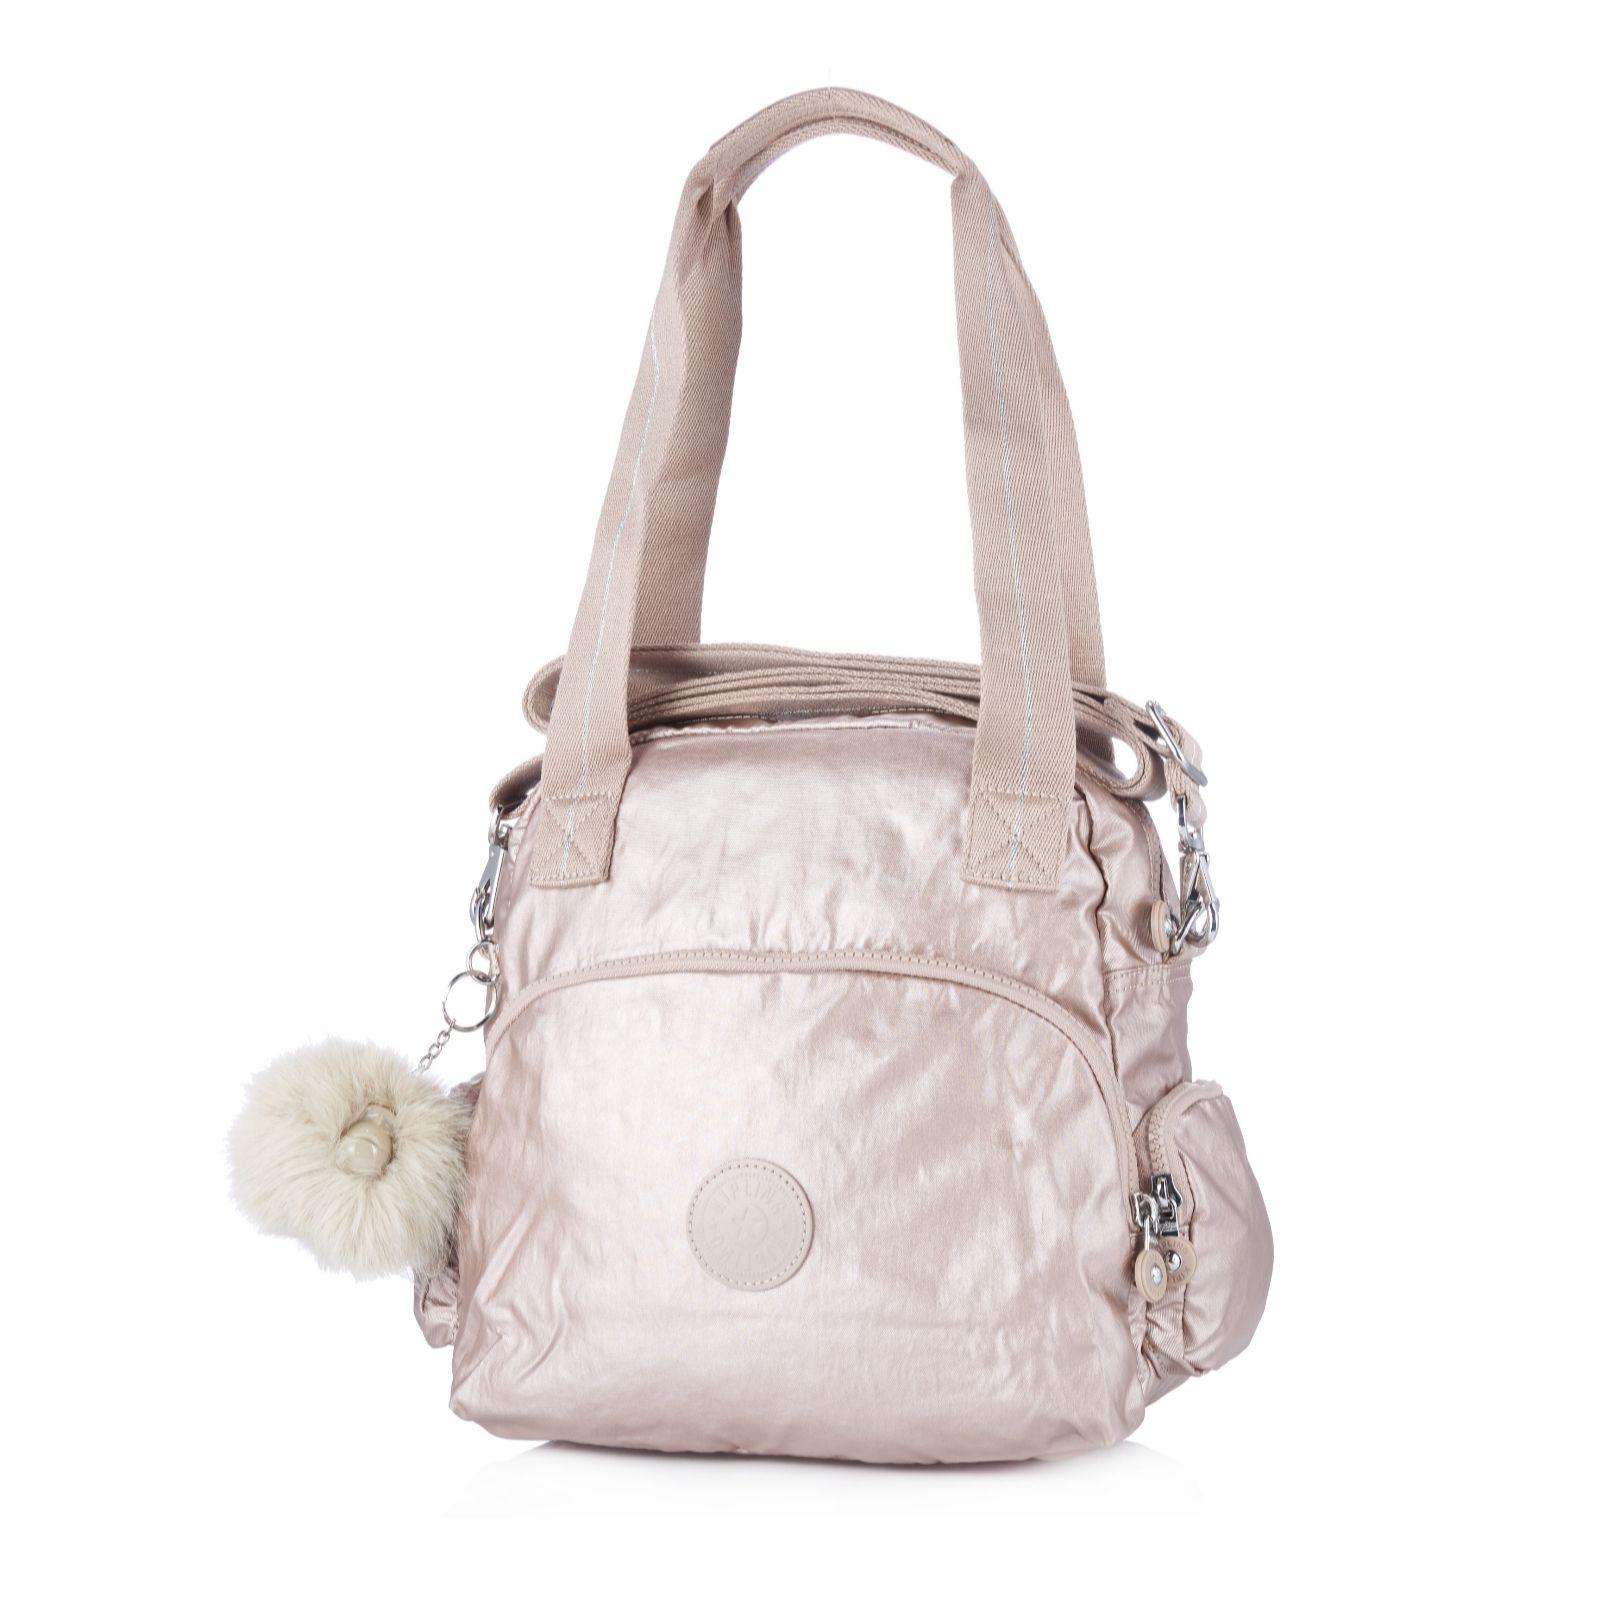 a1c92815b41 Kipling Enelon Premium Shoulder Bag - QVC UK